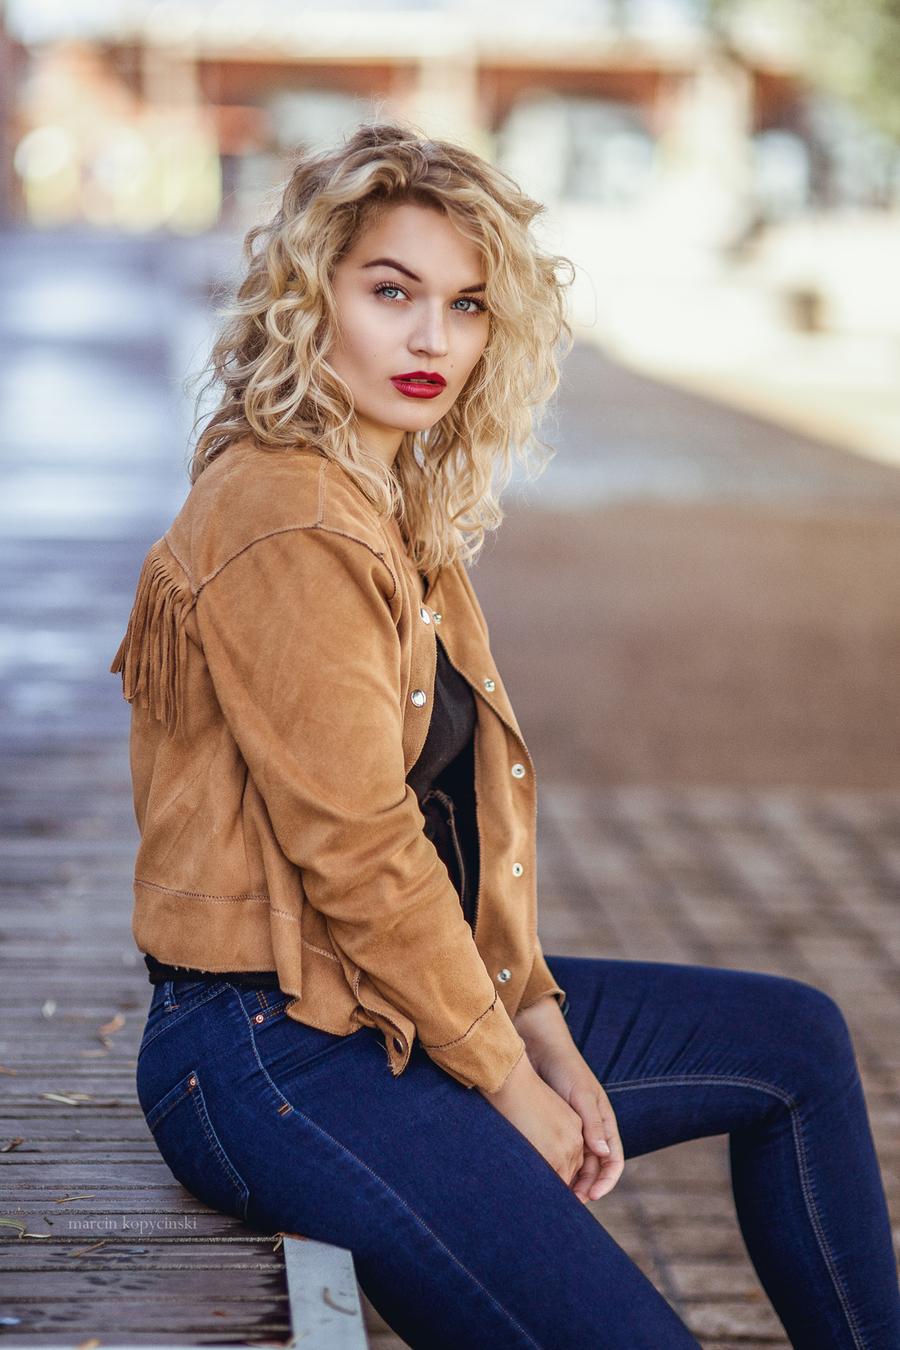 22, A Million / Photography by Marcin K, Model Jessica Megan / Uploaded 1st October 2016 @ 07:20 PM